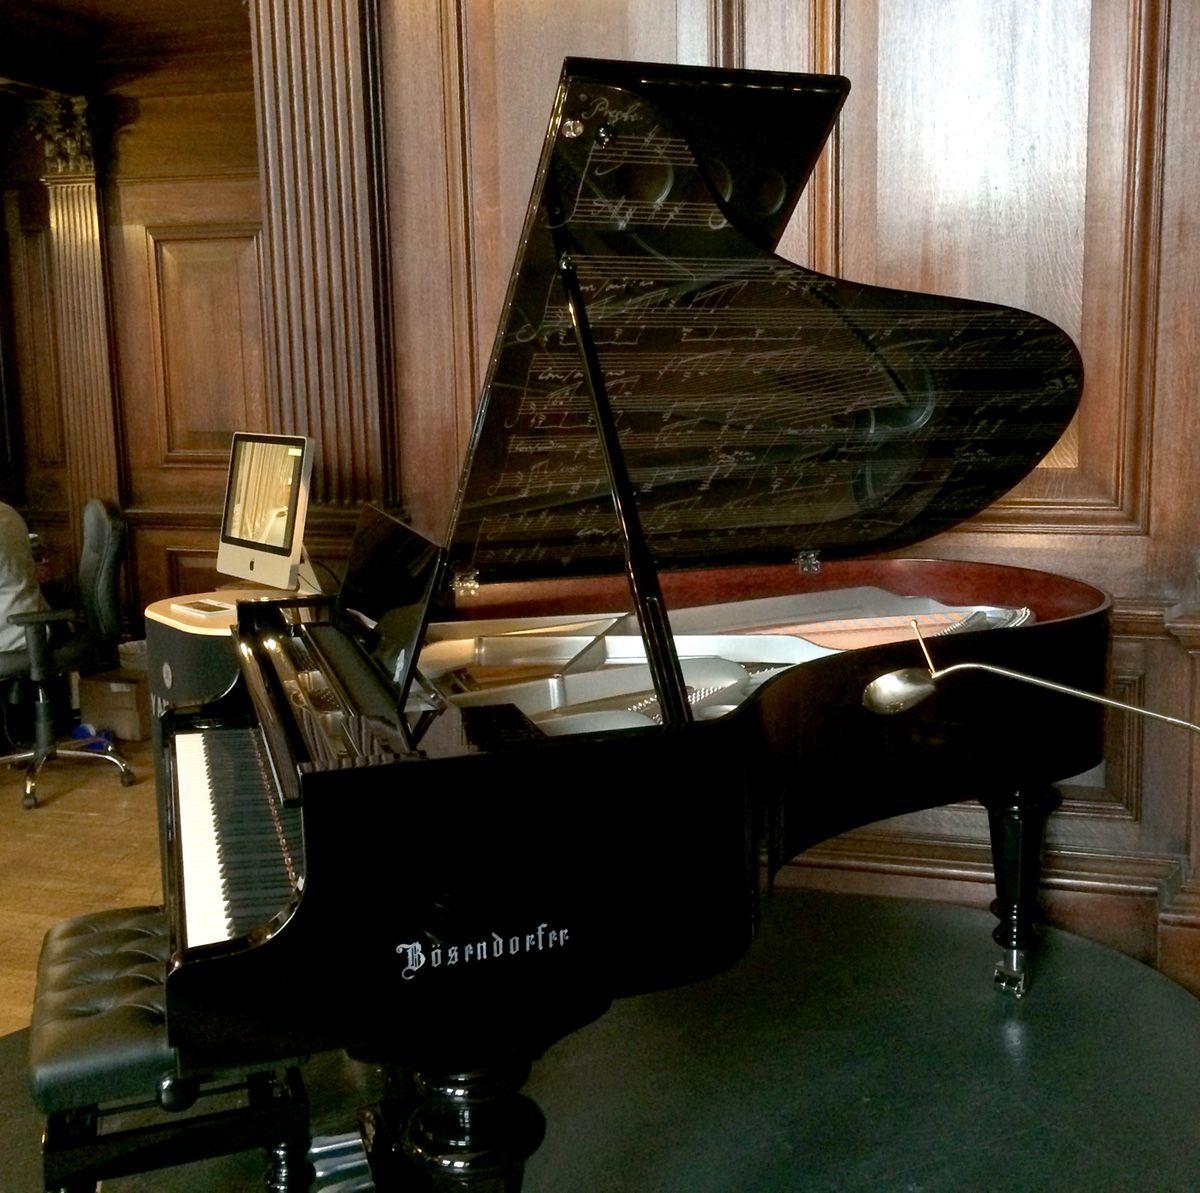 Beethoven' Model 200 Grand Piano In Unique Polished Ebony & Chrome